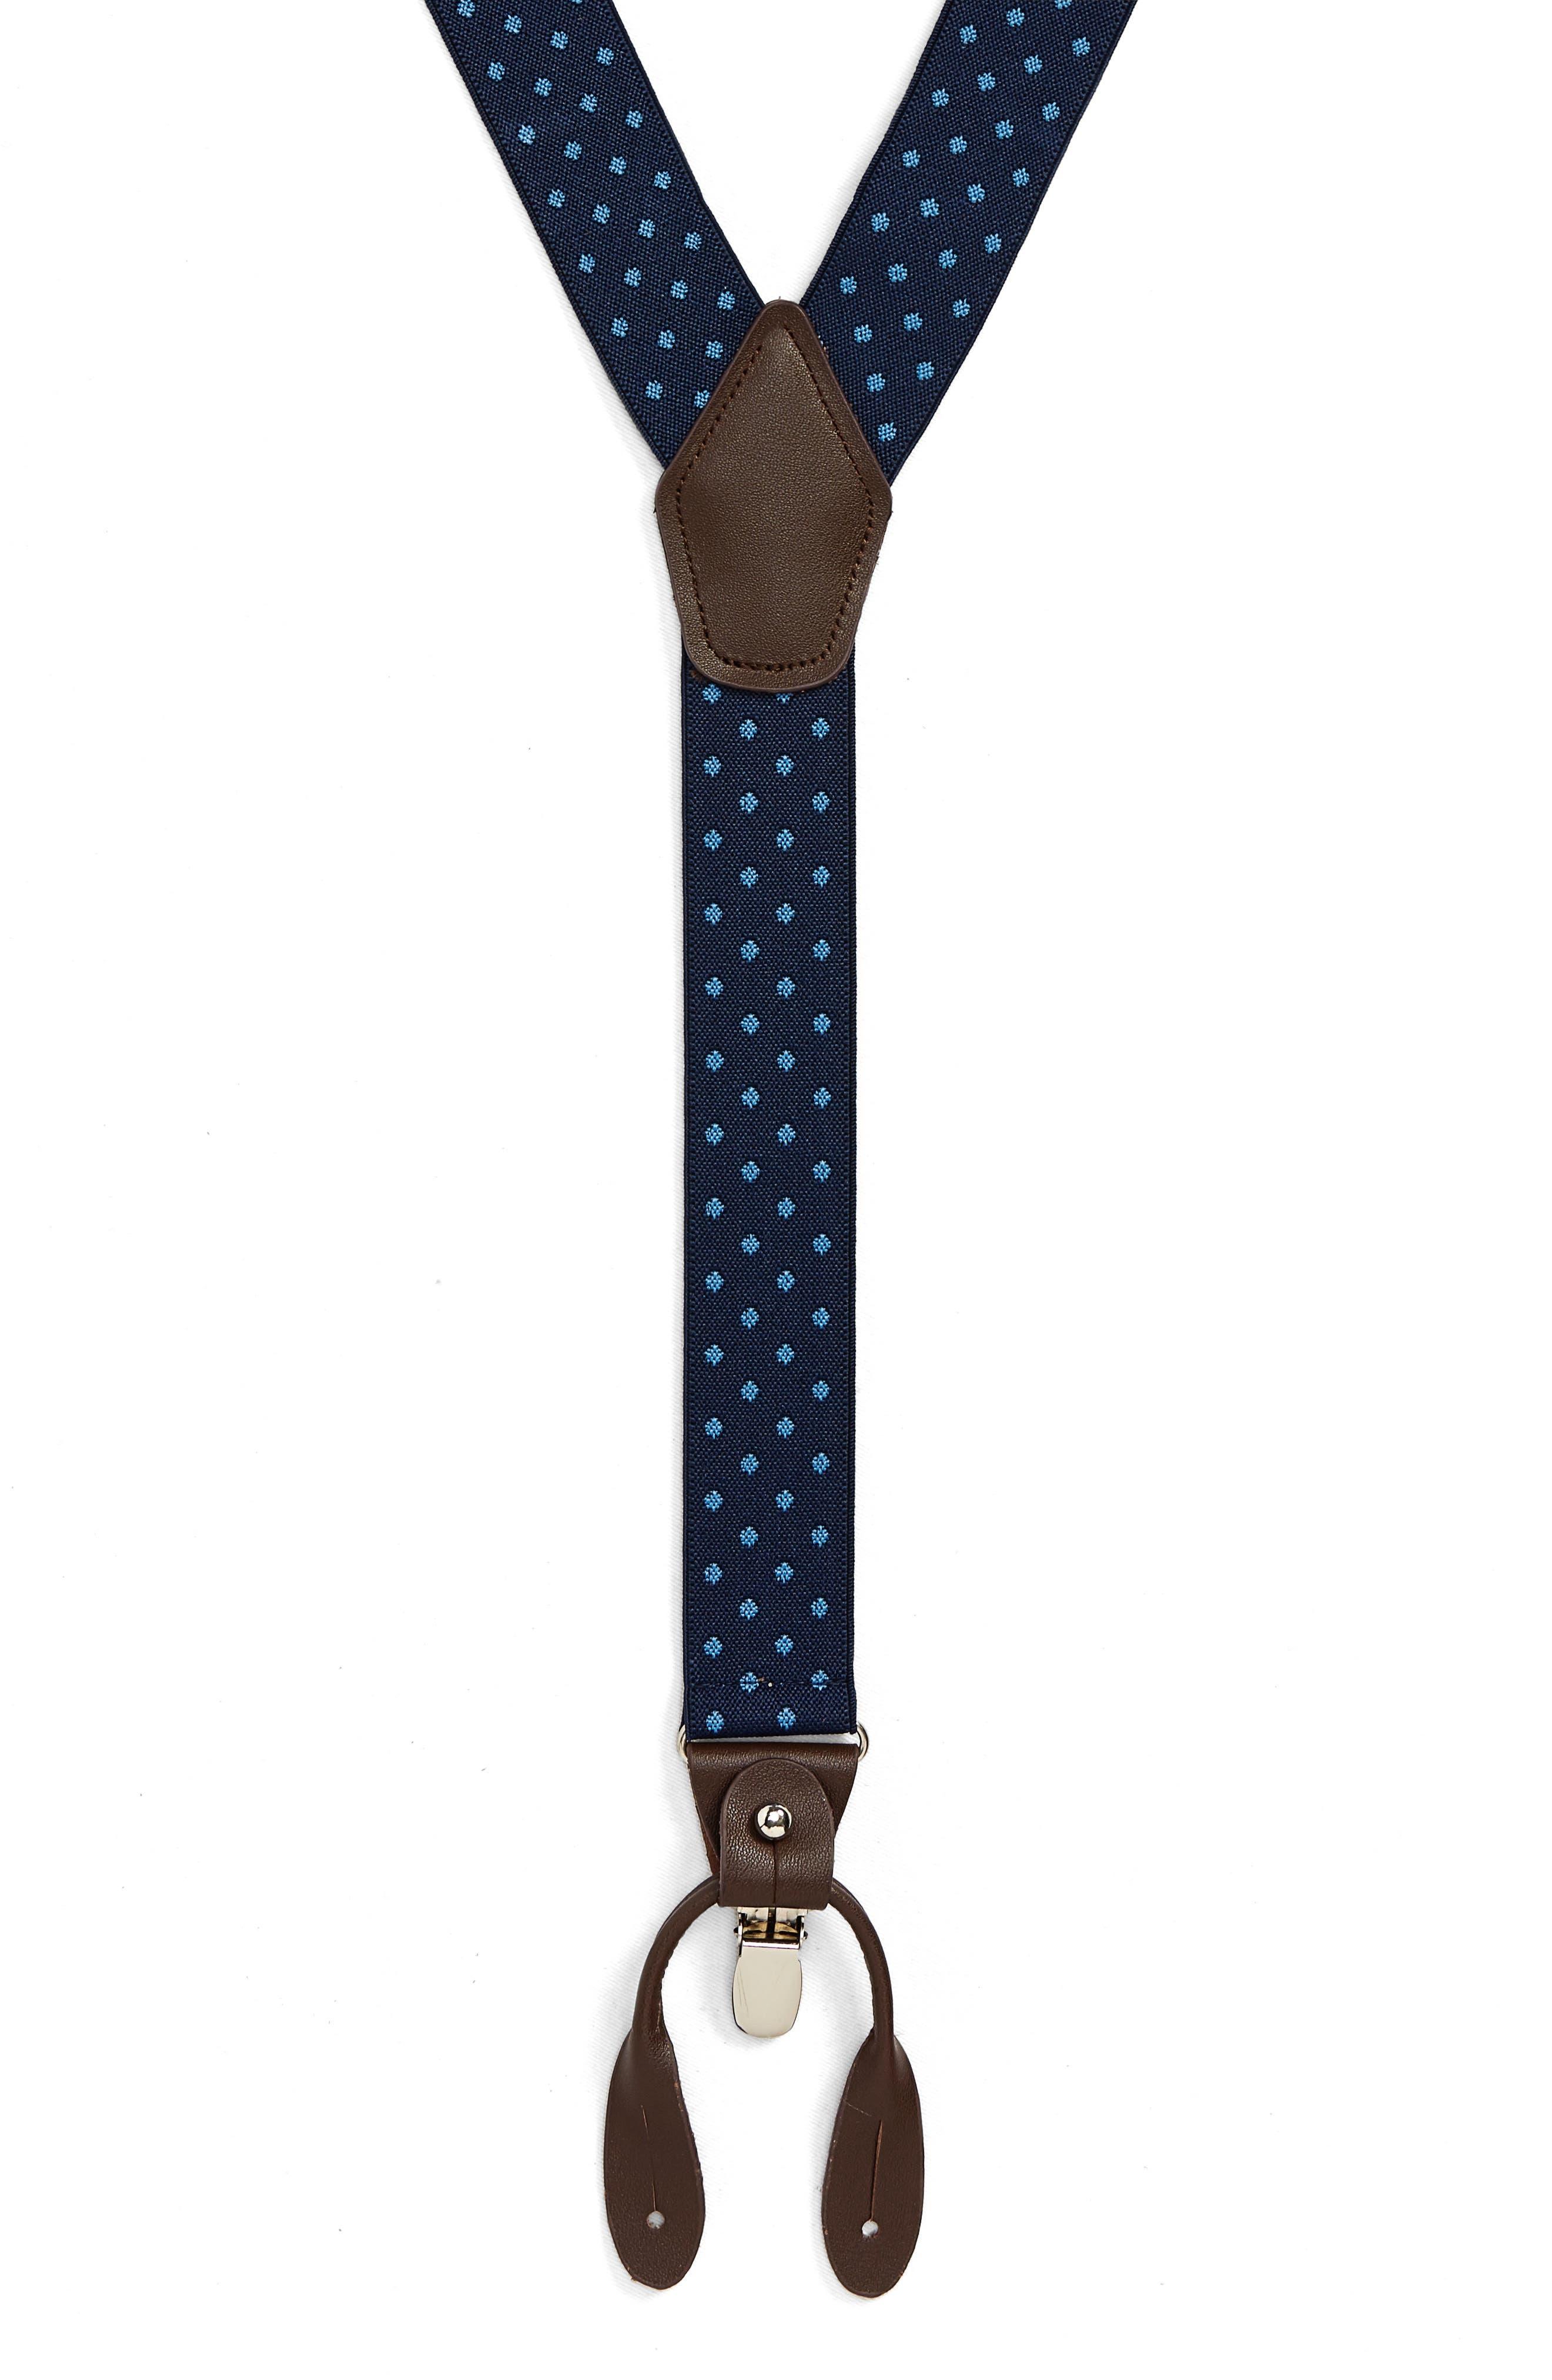 Woven Dot Suspenders,                             Main thumbnail 1, color,                             NAVY/ BLUE